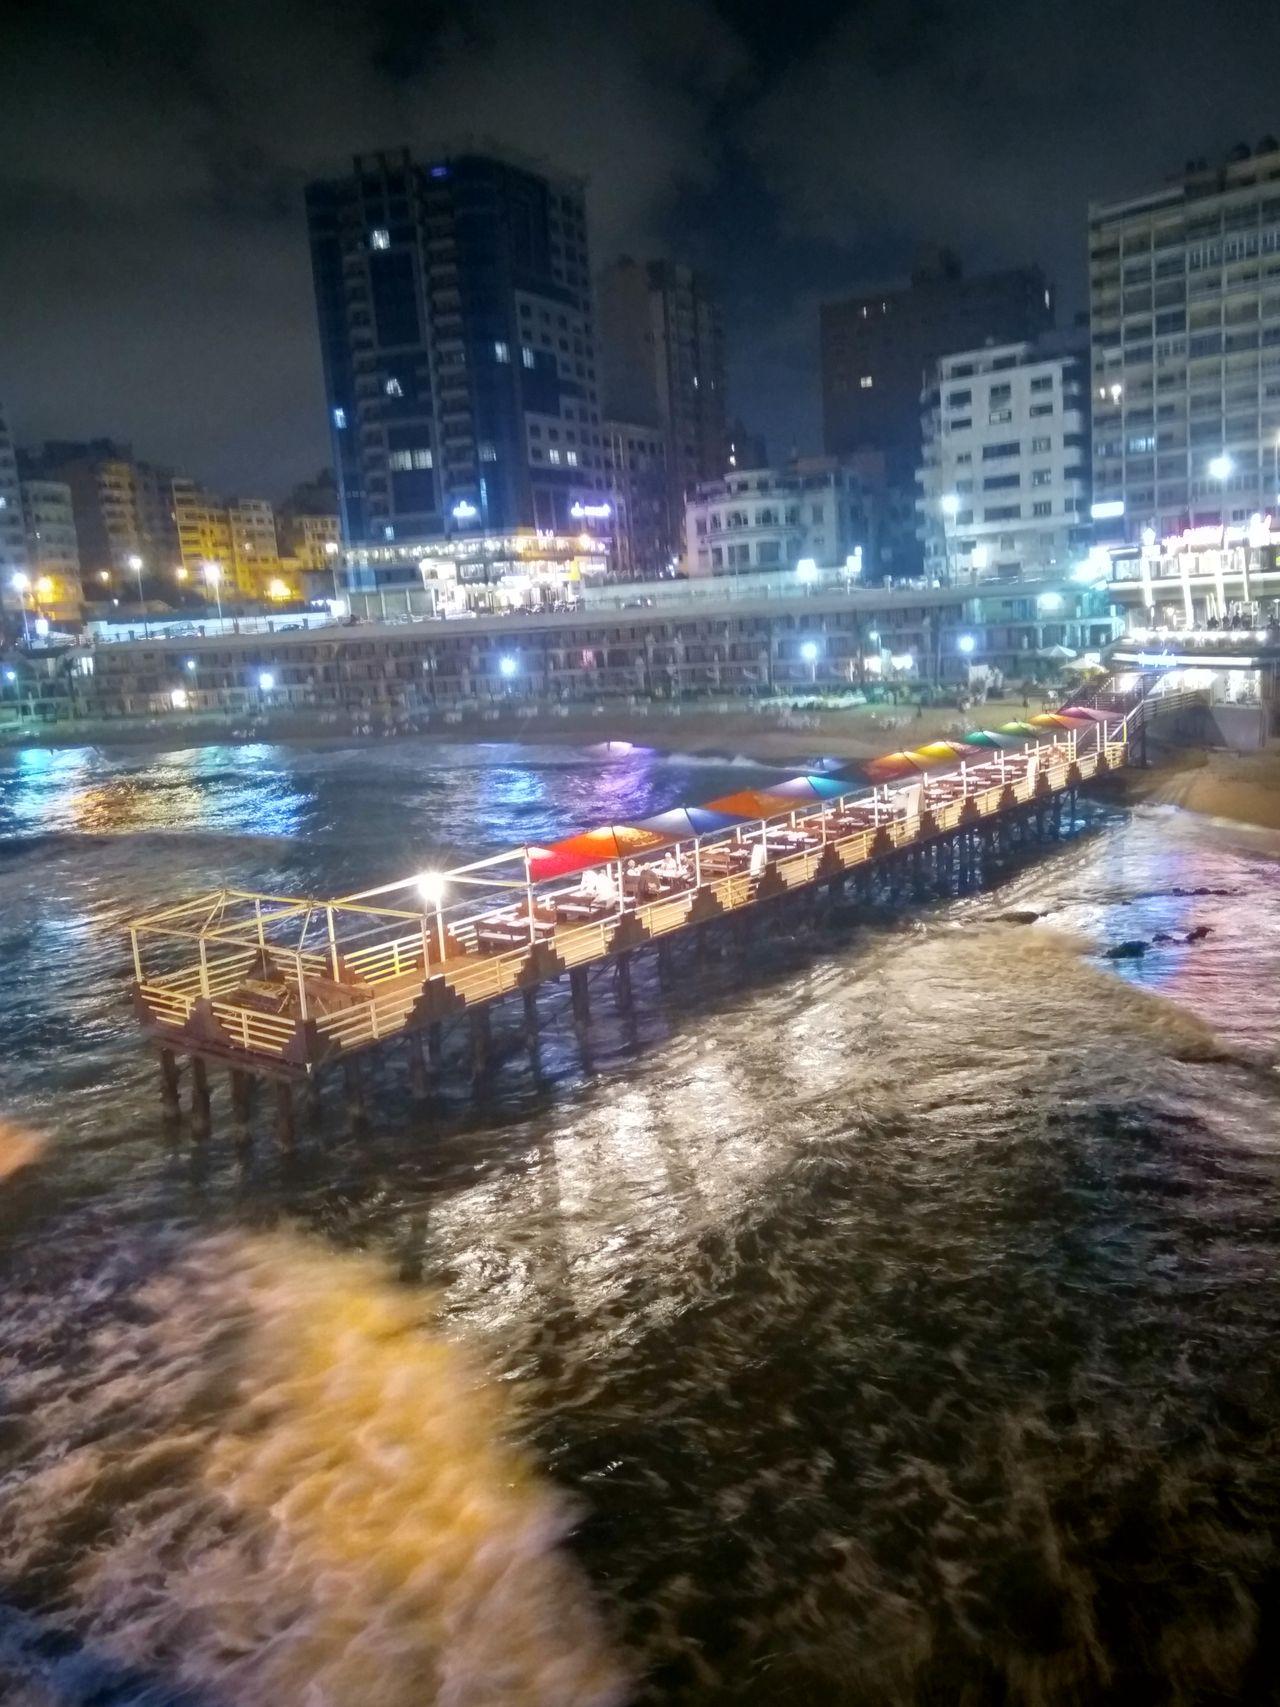 Night City No People Water Alexandria Egypt Stanly Bridge BeautyofEgypt First Eyeem Photo